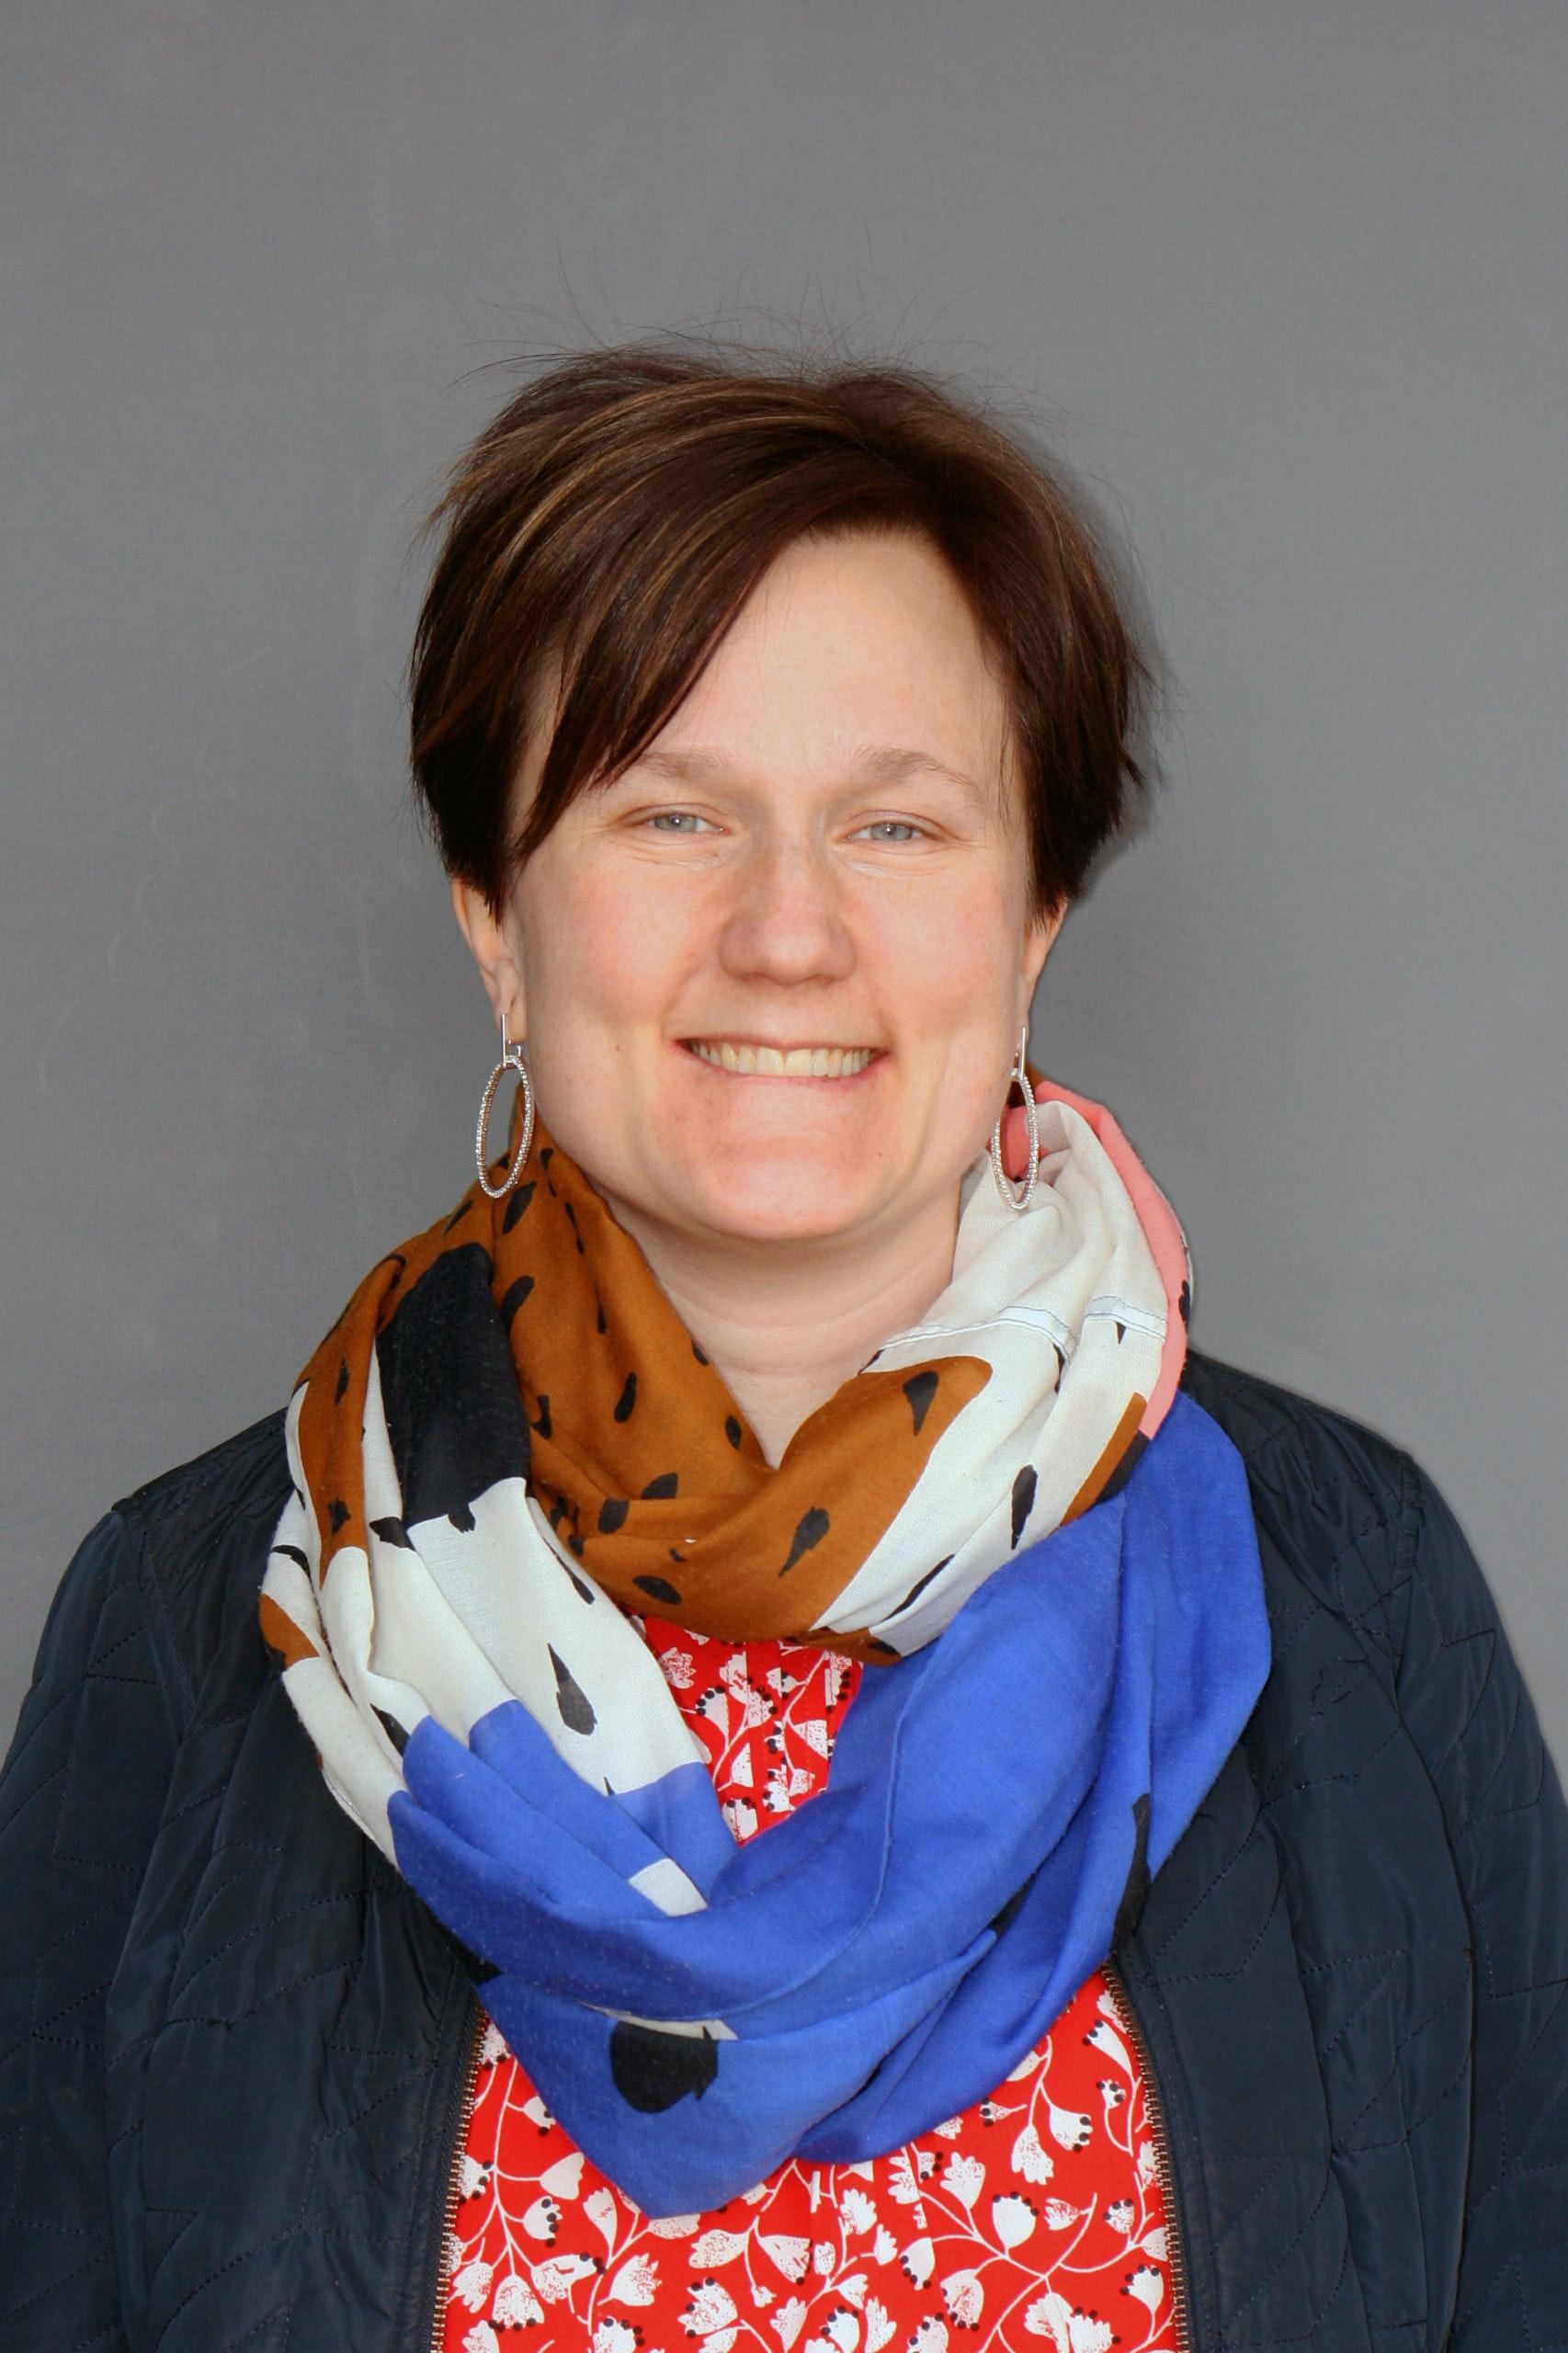 Amanda Lindlöf